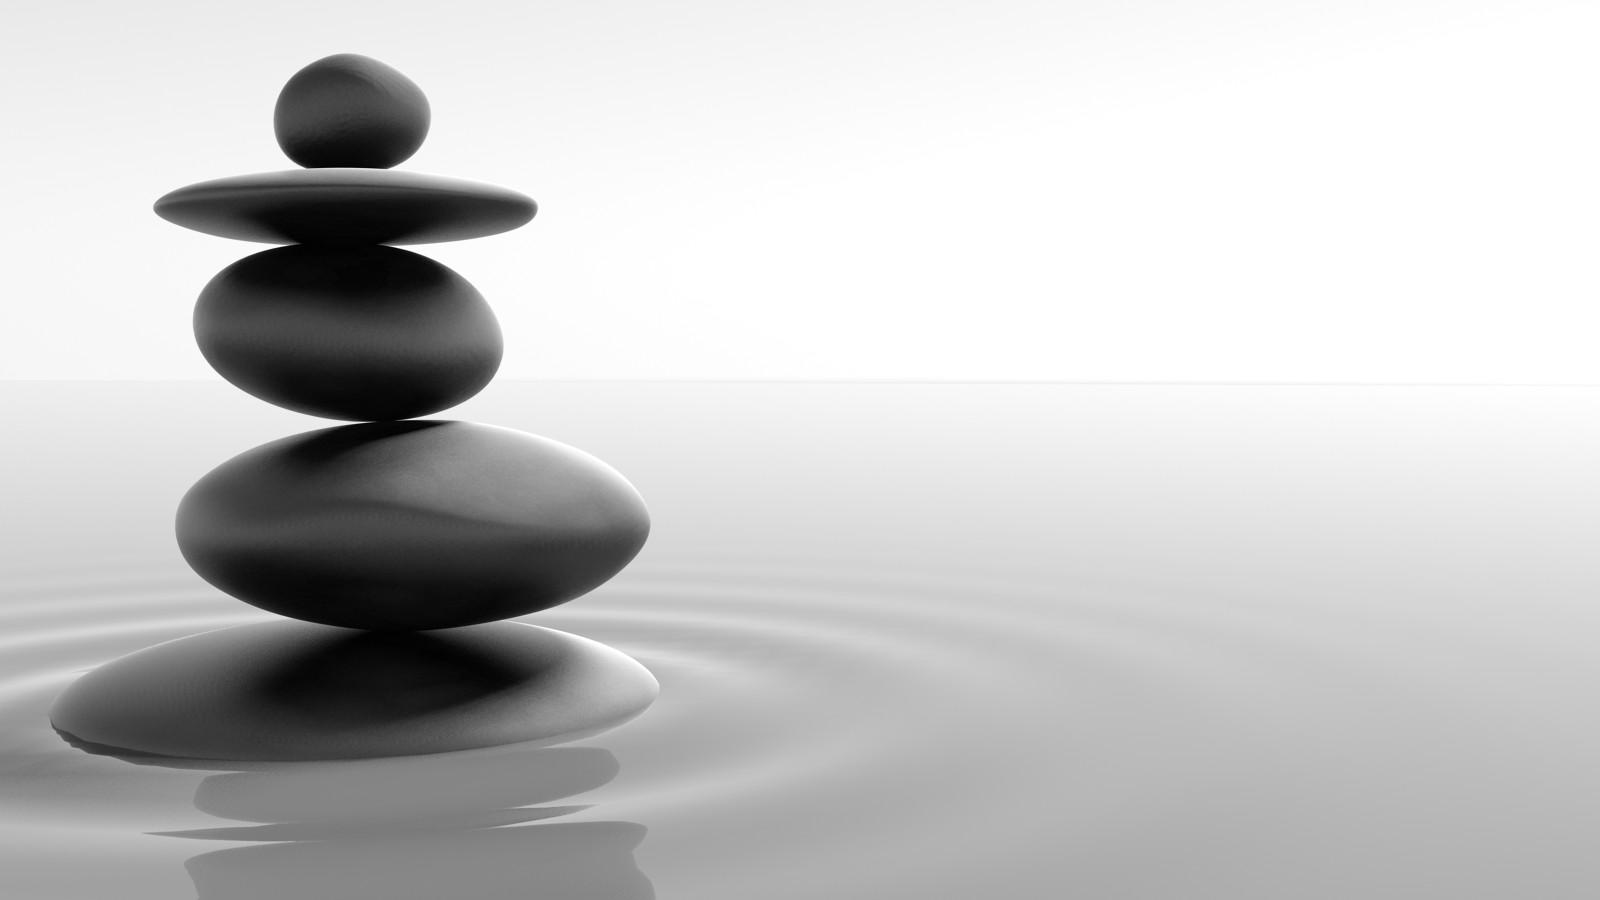 Pietre Zen in Equilibrio Tao   Sfondo Schermo Download   ZENTAO 1600x900